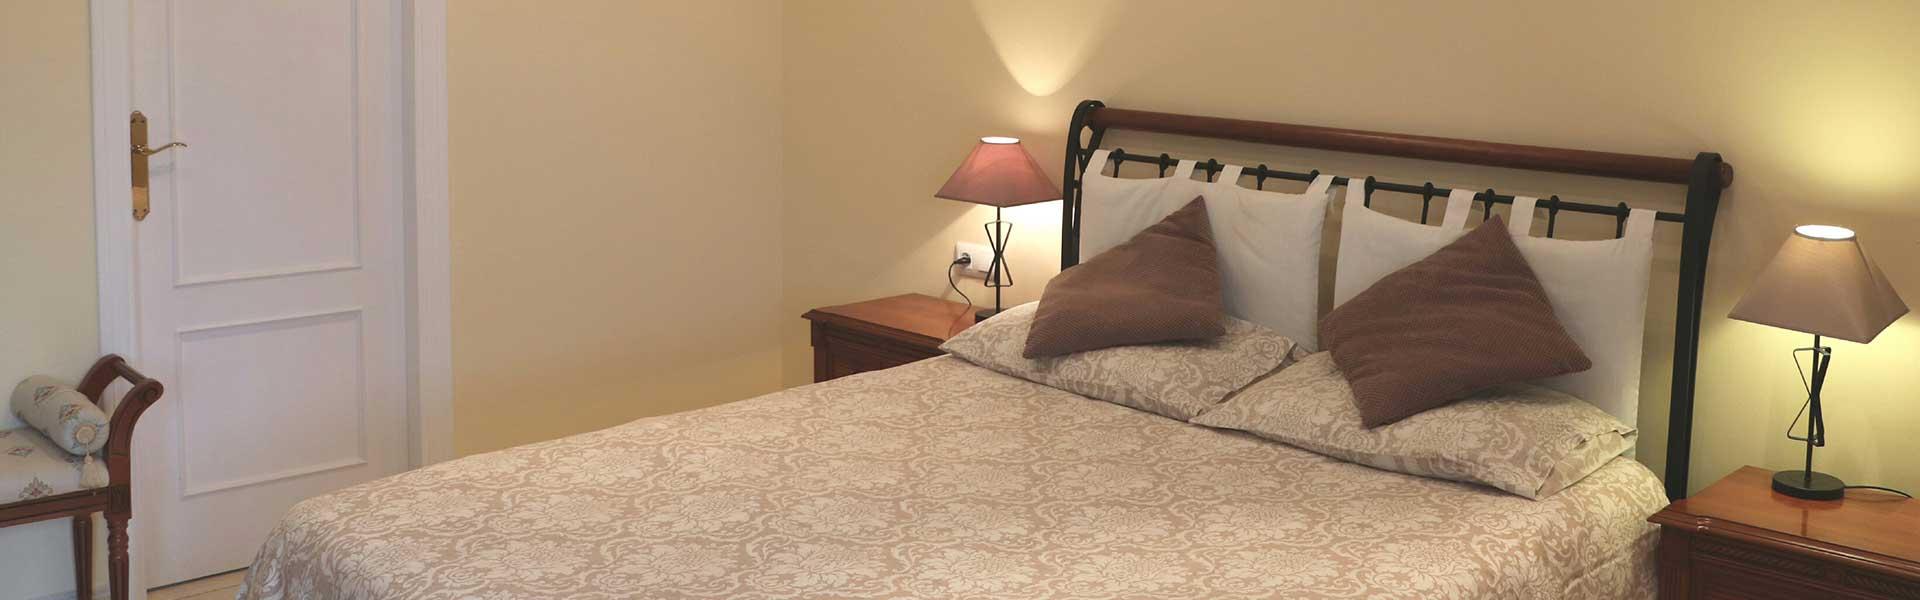 Finca-San-Mateo_rooms-header